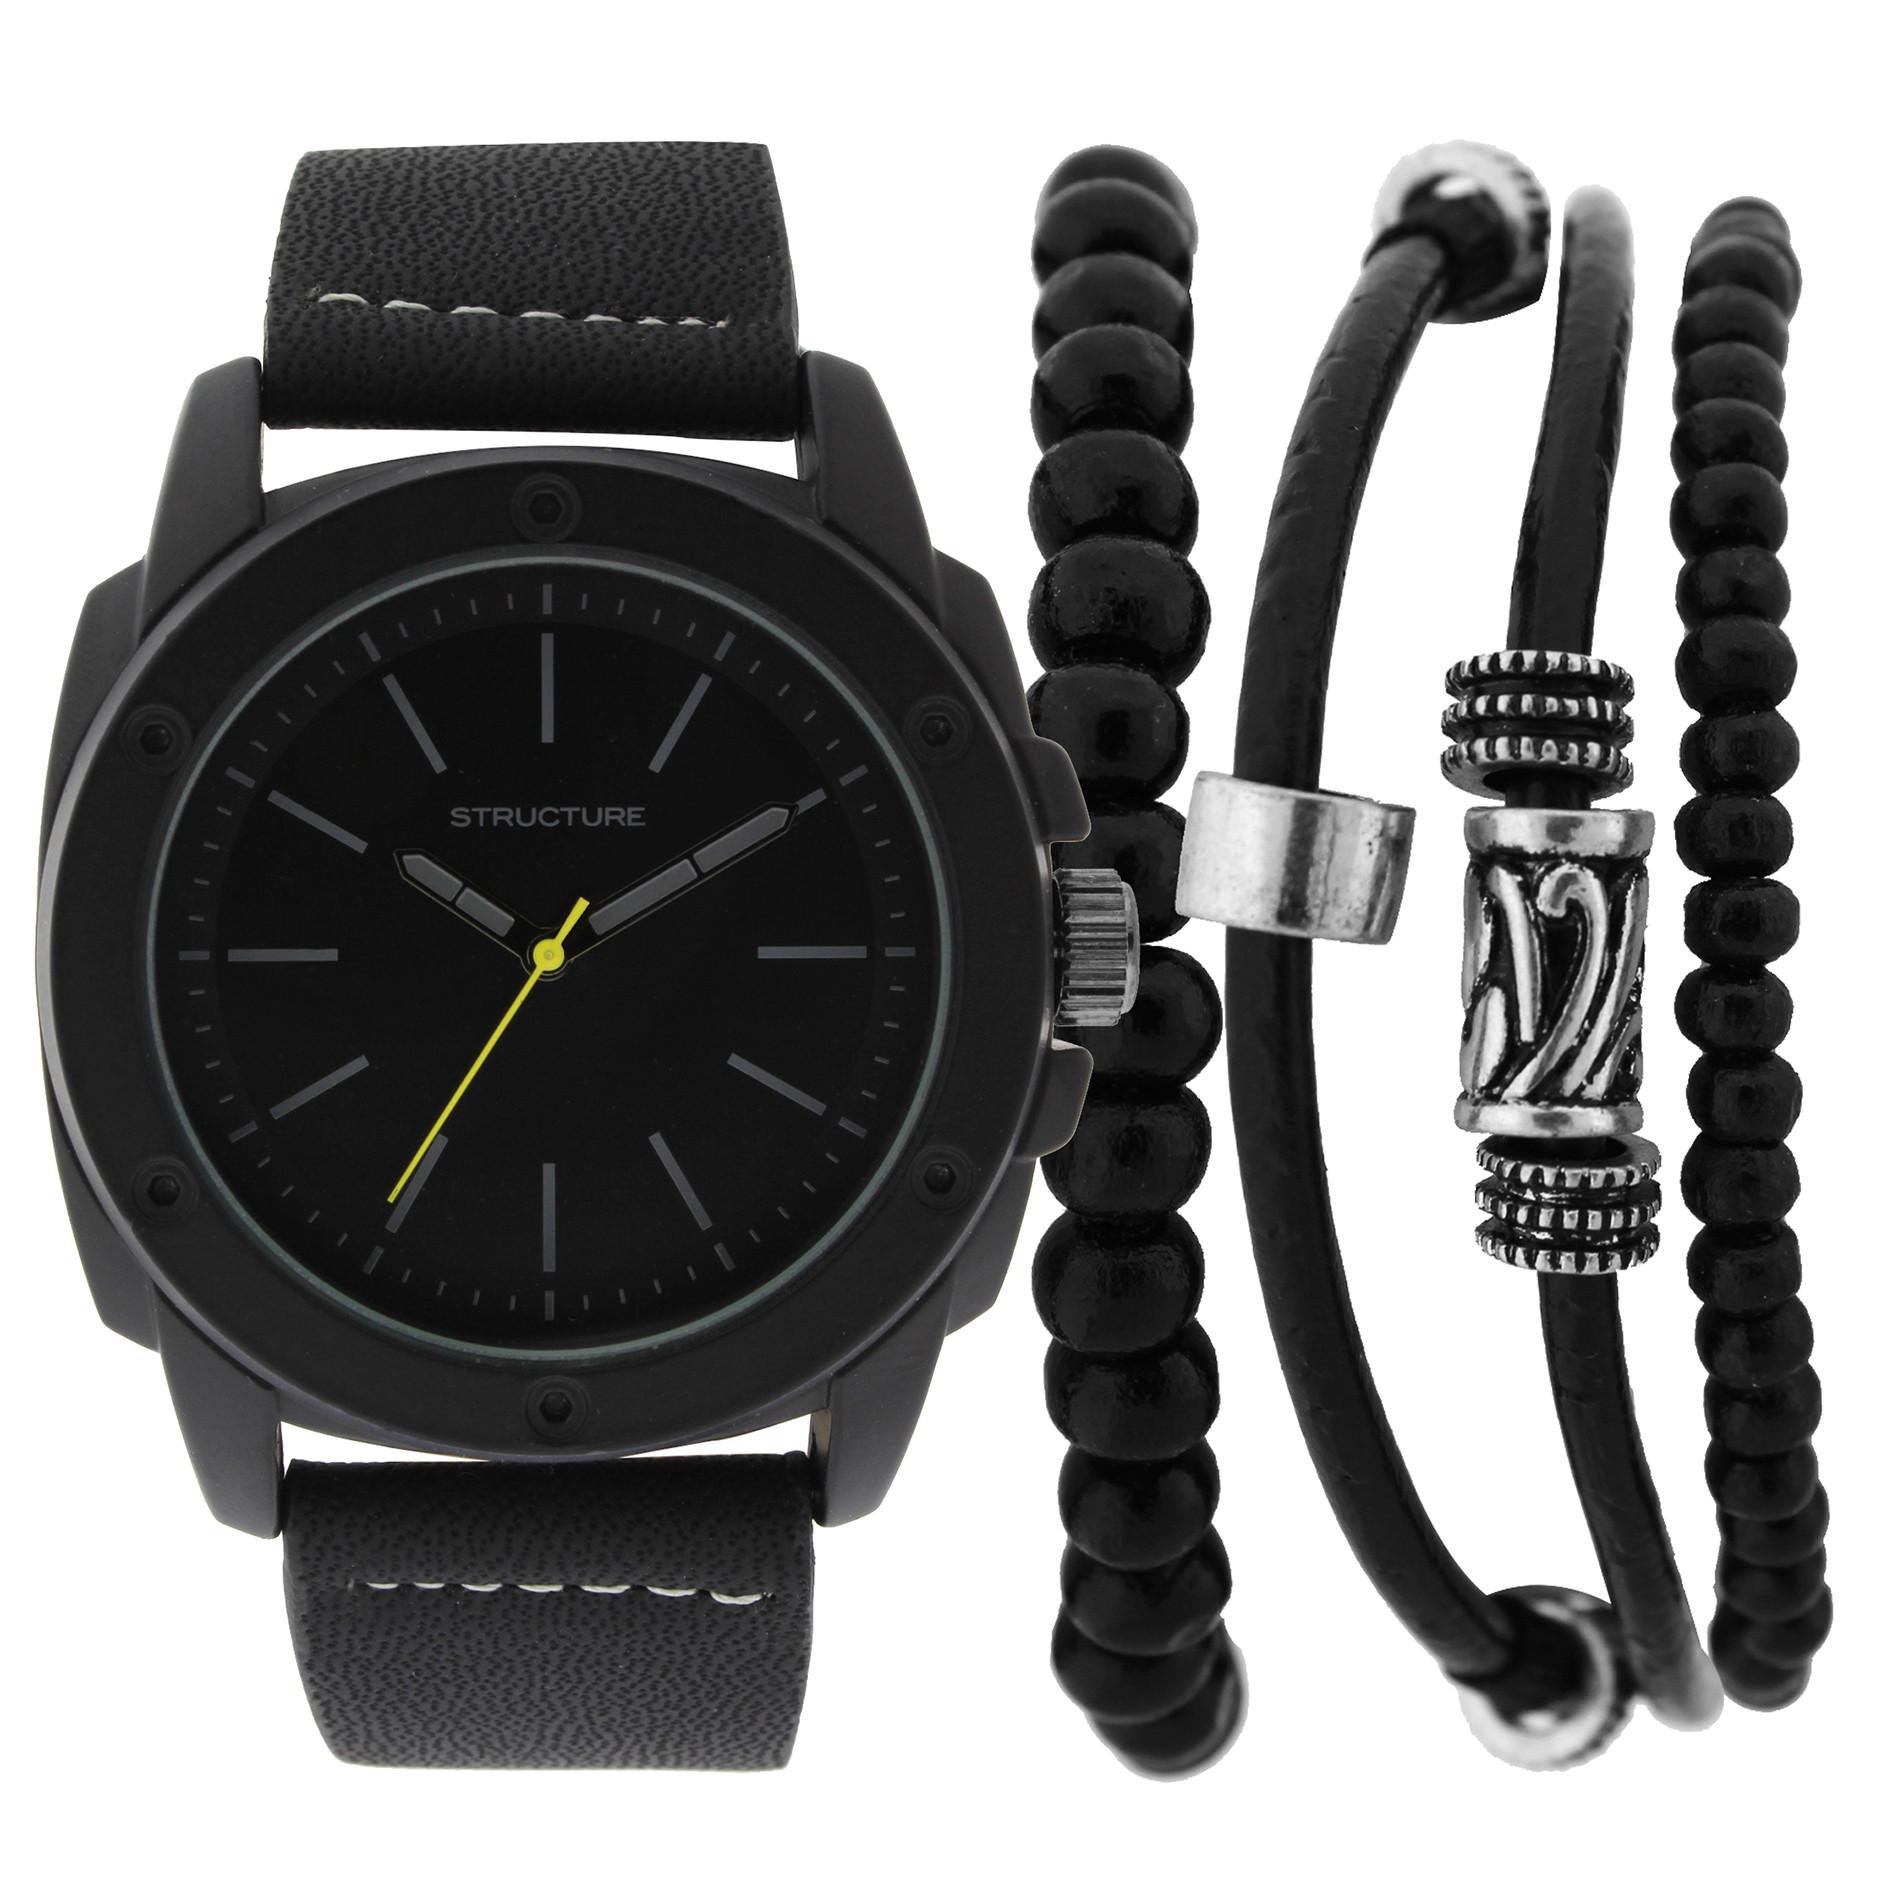 Bracelet And Watch Set  Structure Men s Watch & Bracelet Set